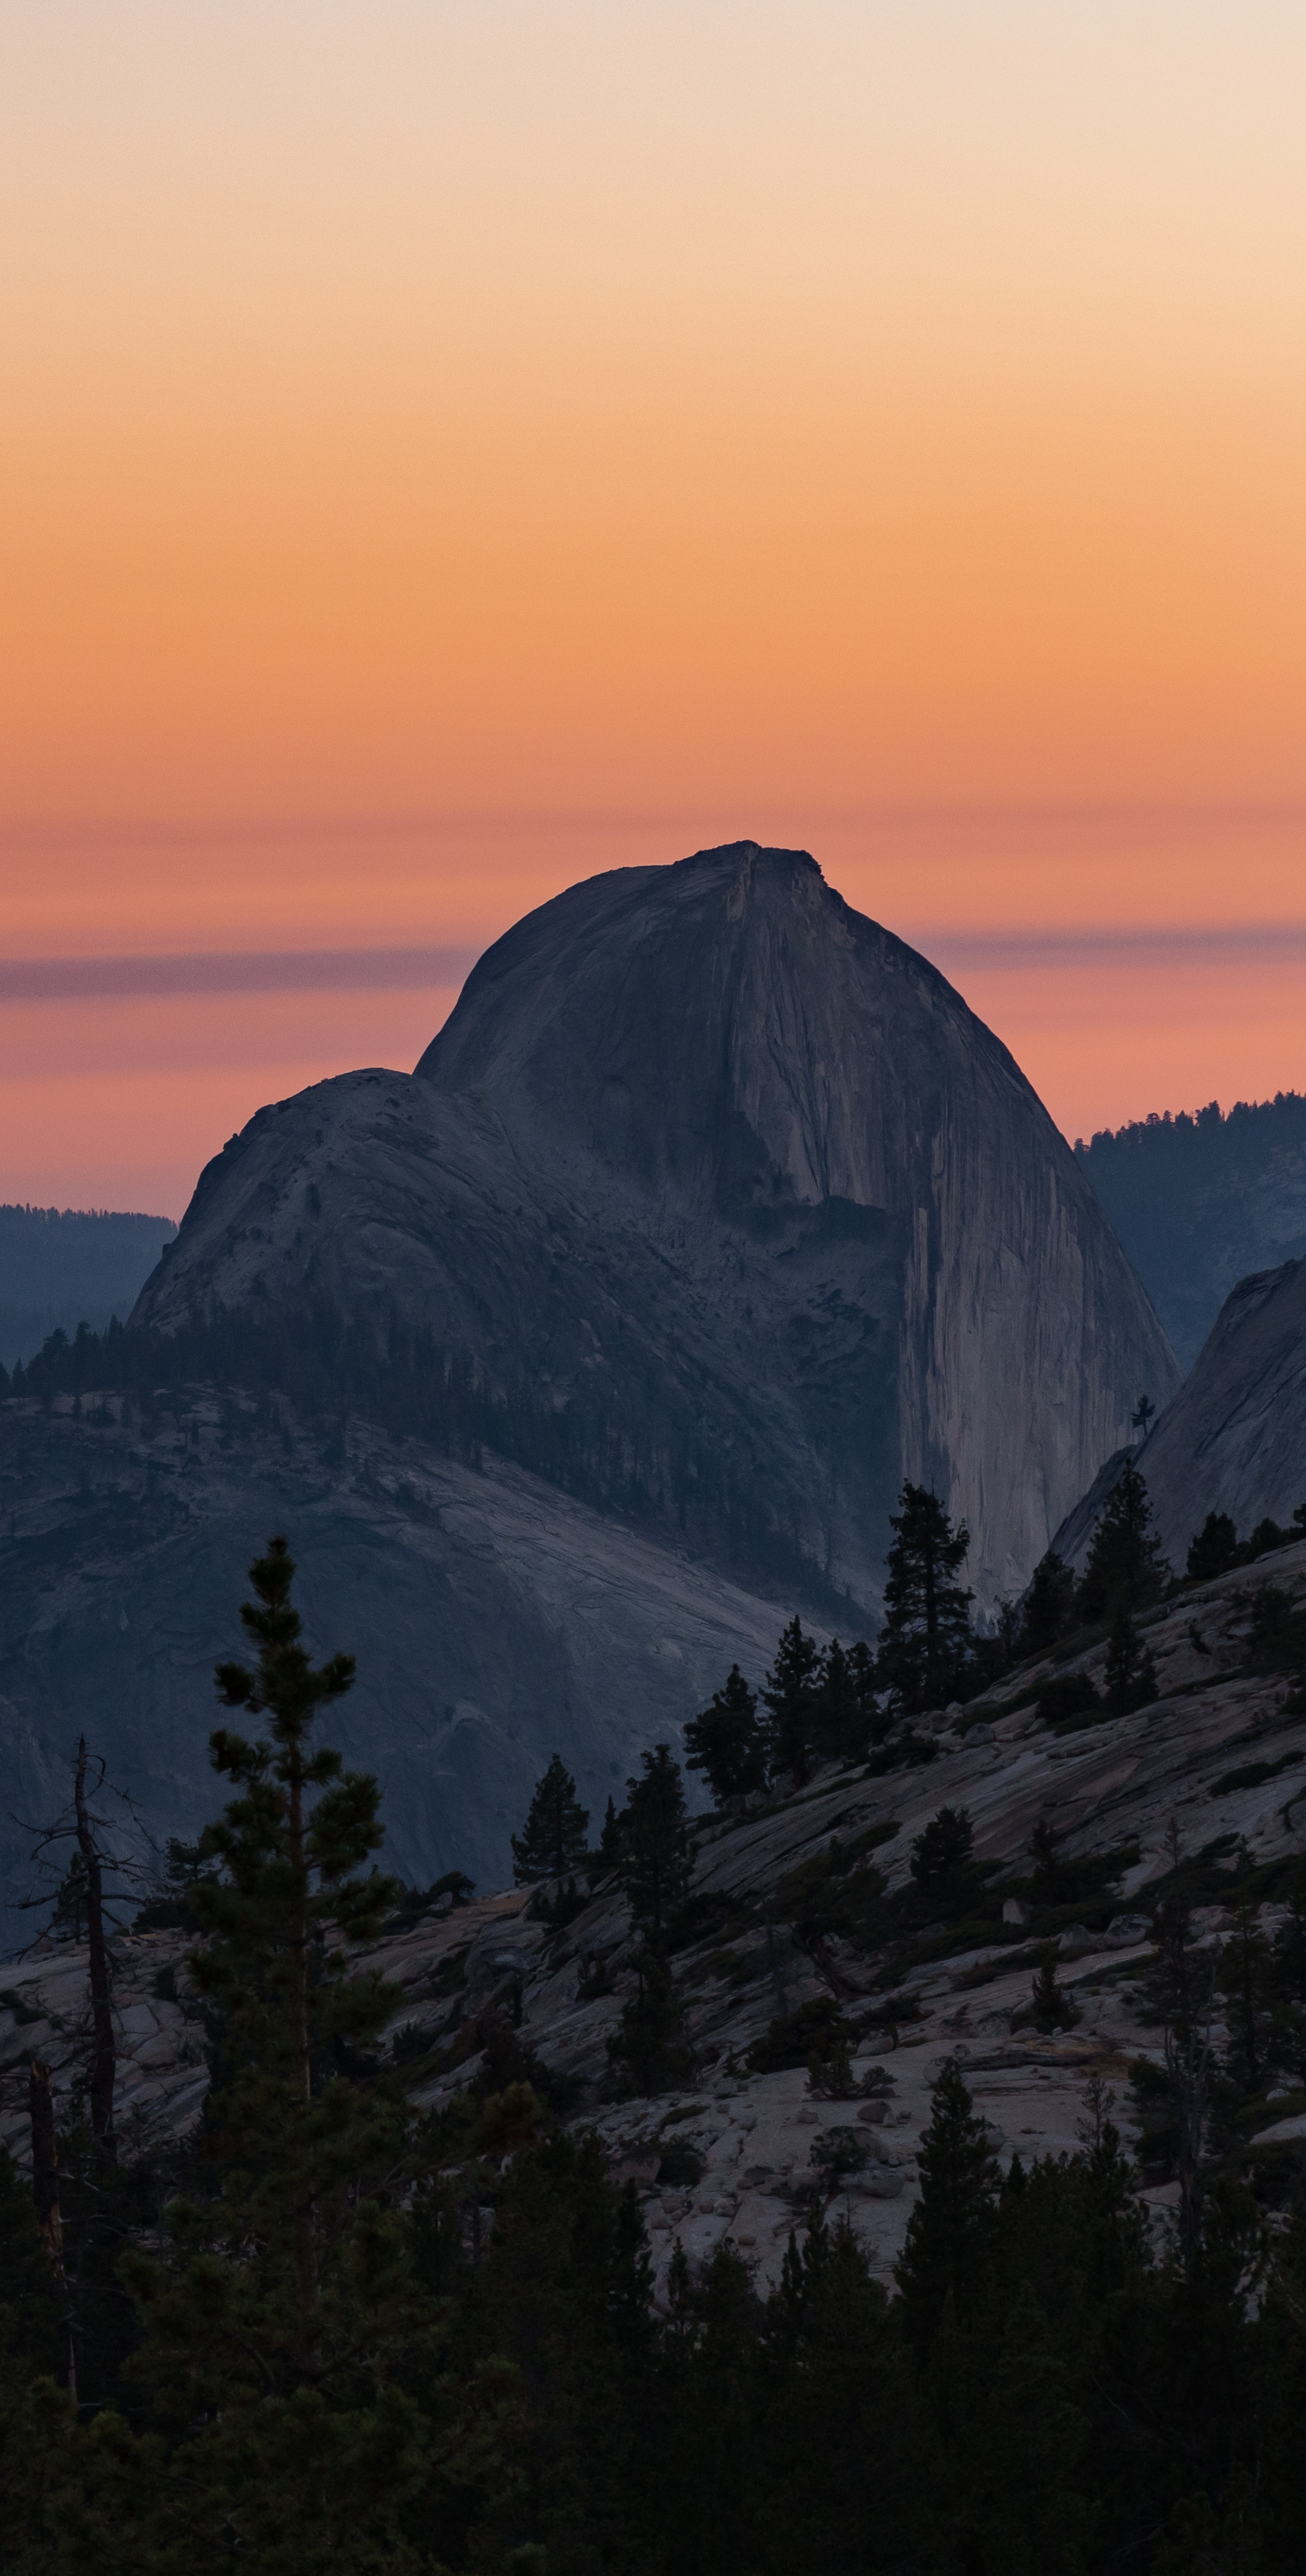 Yosemite_A6500 Sunday 21st May Lake Tuolumne Olmsted (12 of 25).jpg